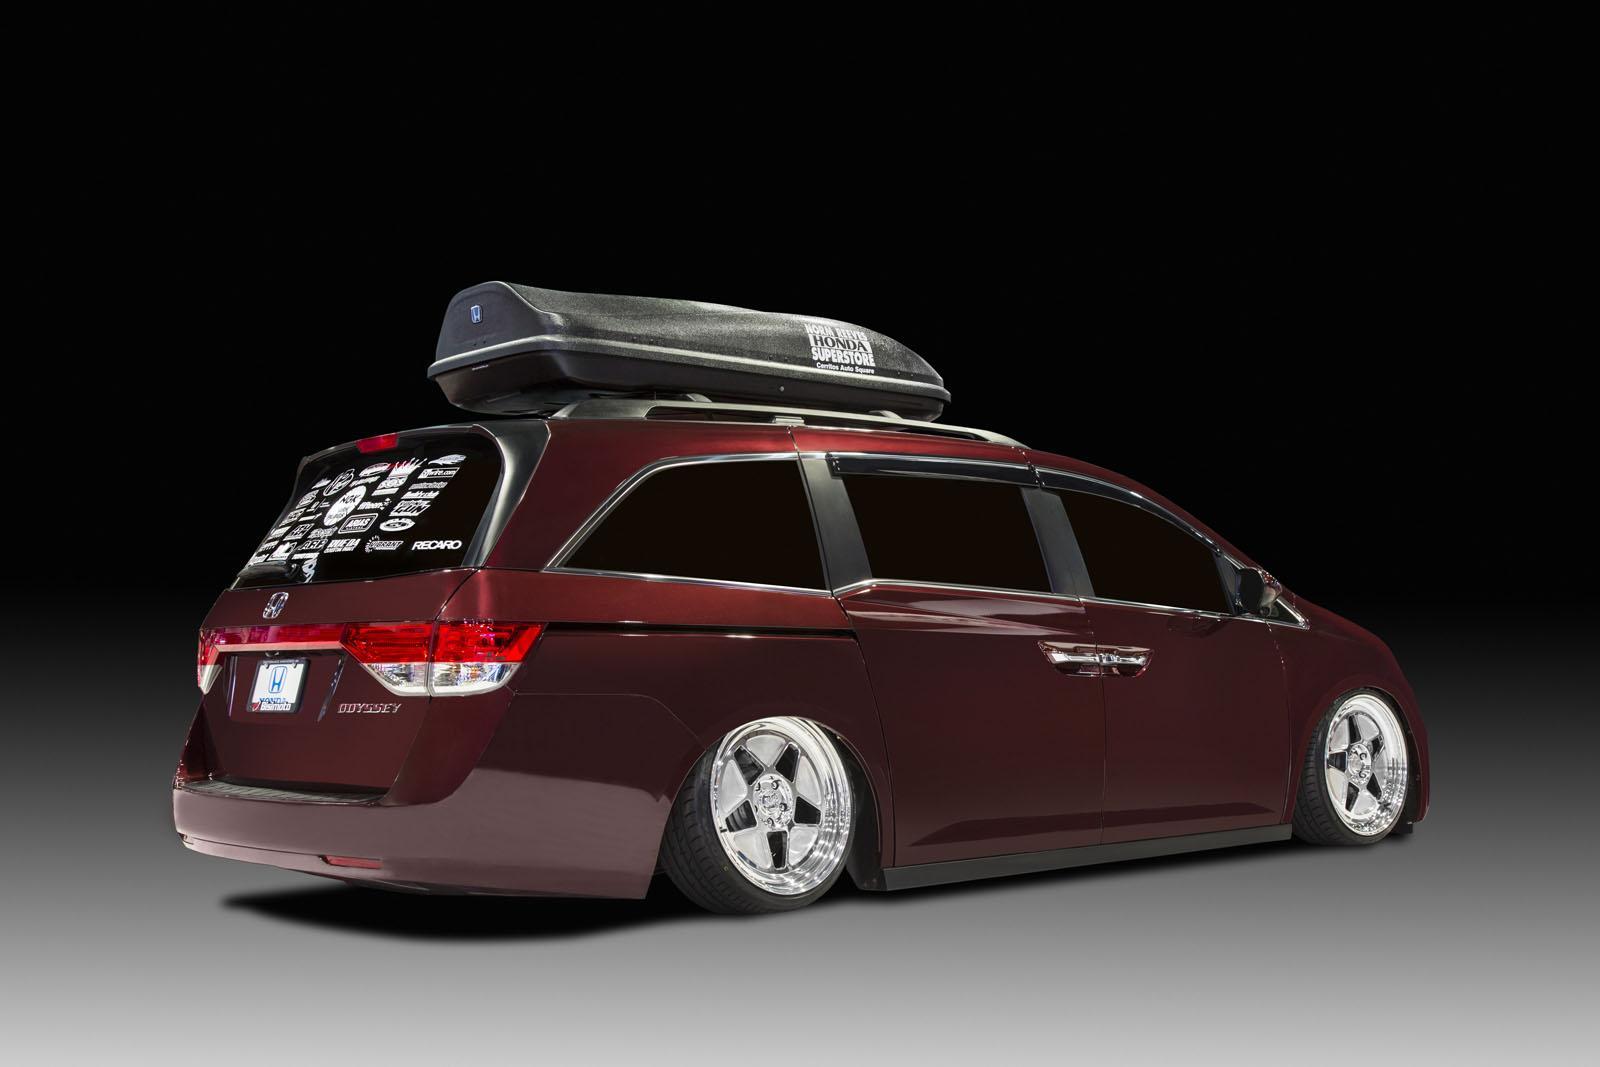 2014 Honda Odyssey Recalled for Airbag Problem - autoevolution